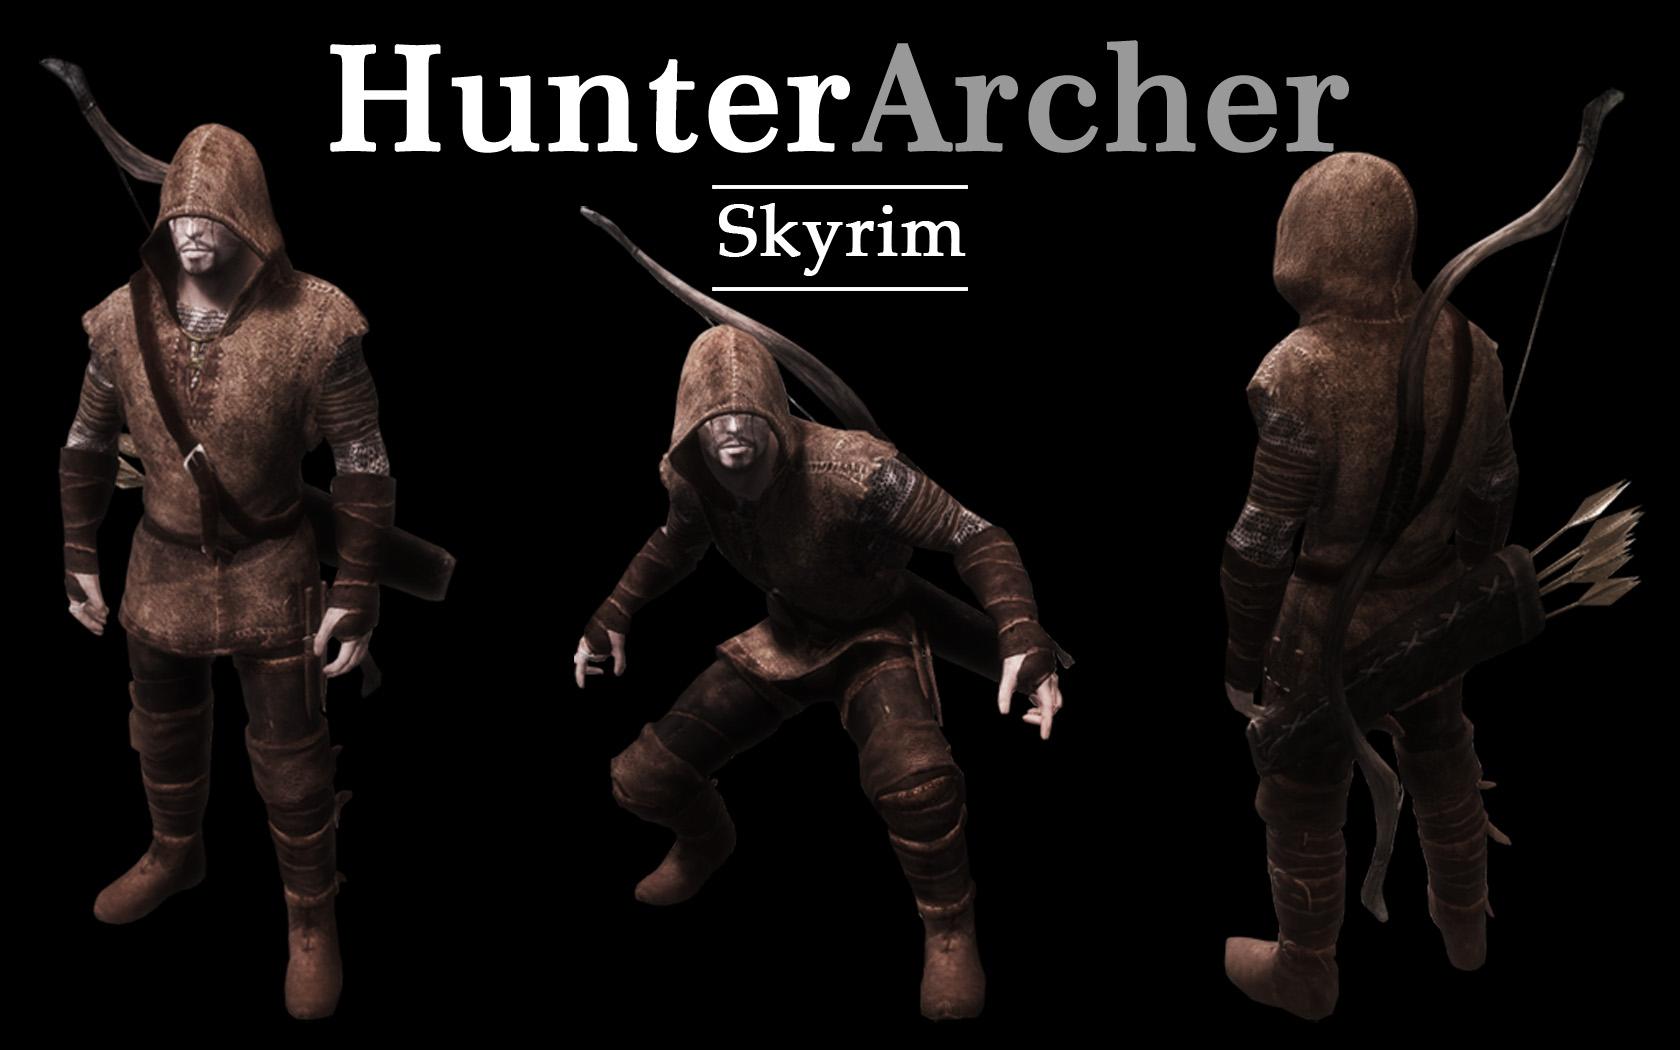 Hunter_Archer_Armor.jpg